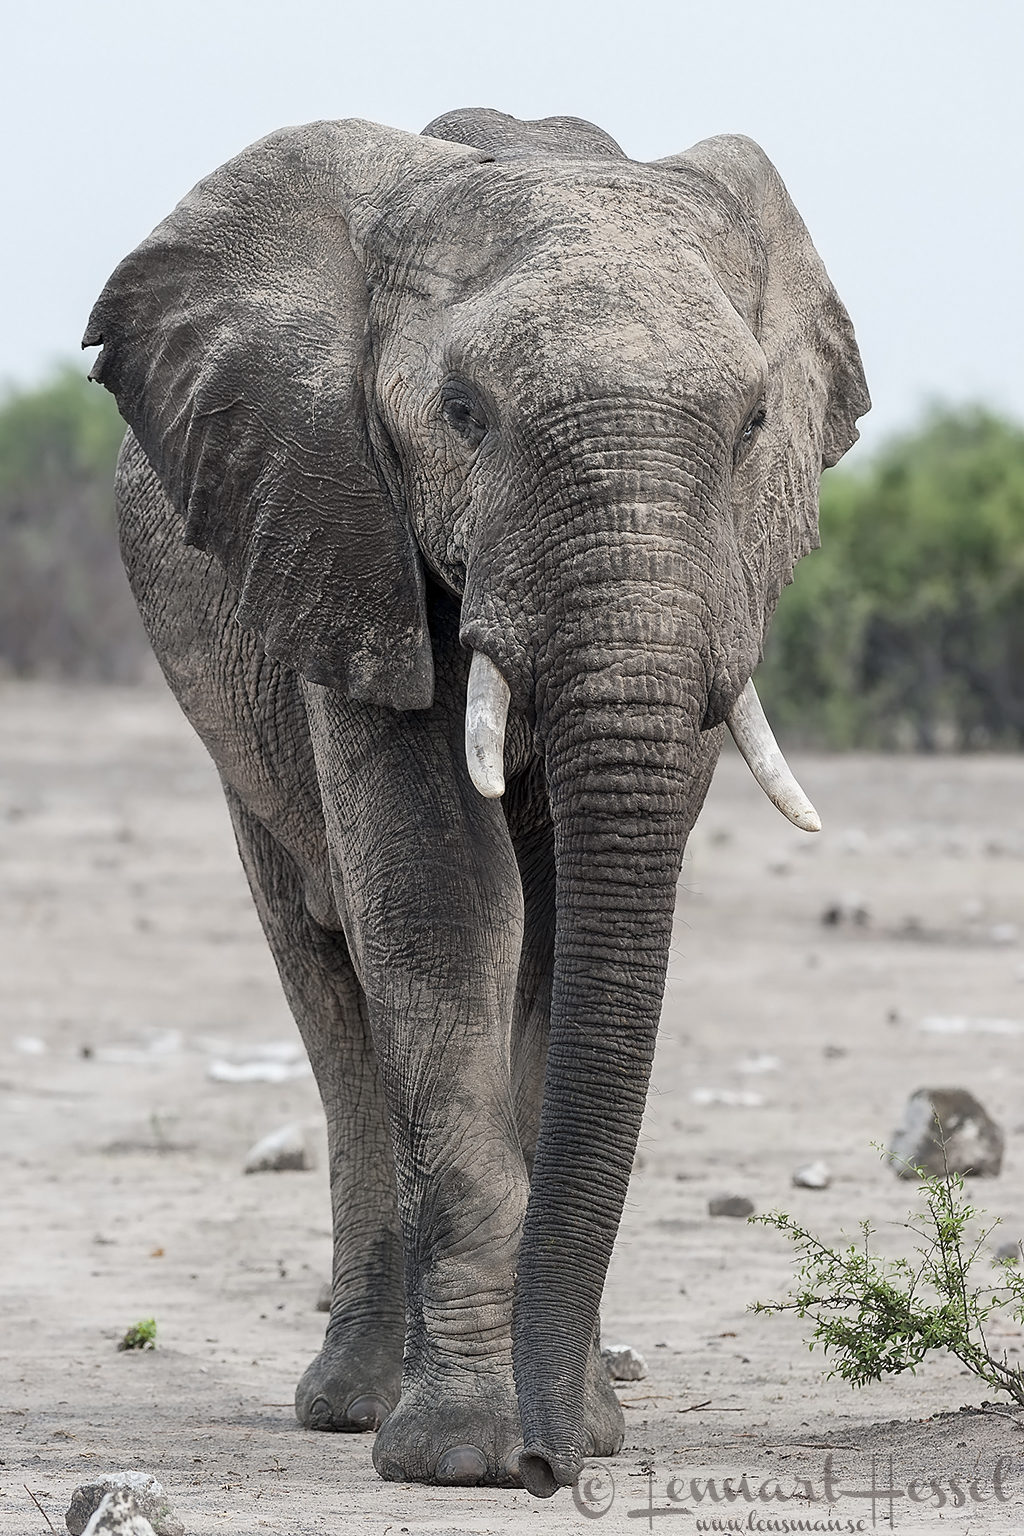 Elephant Bull in Chobe National Park, Botswana